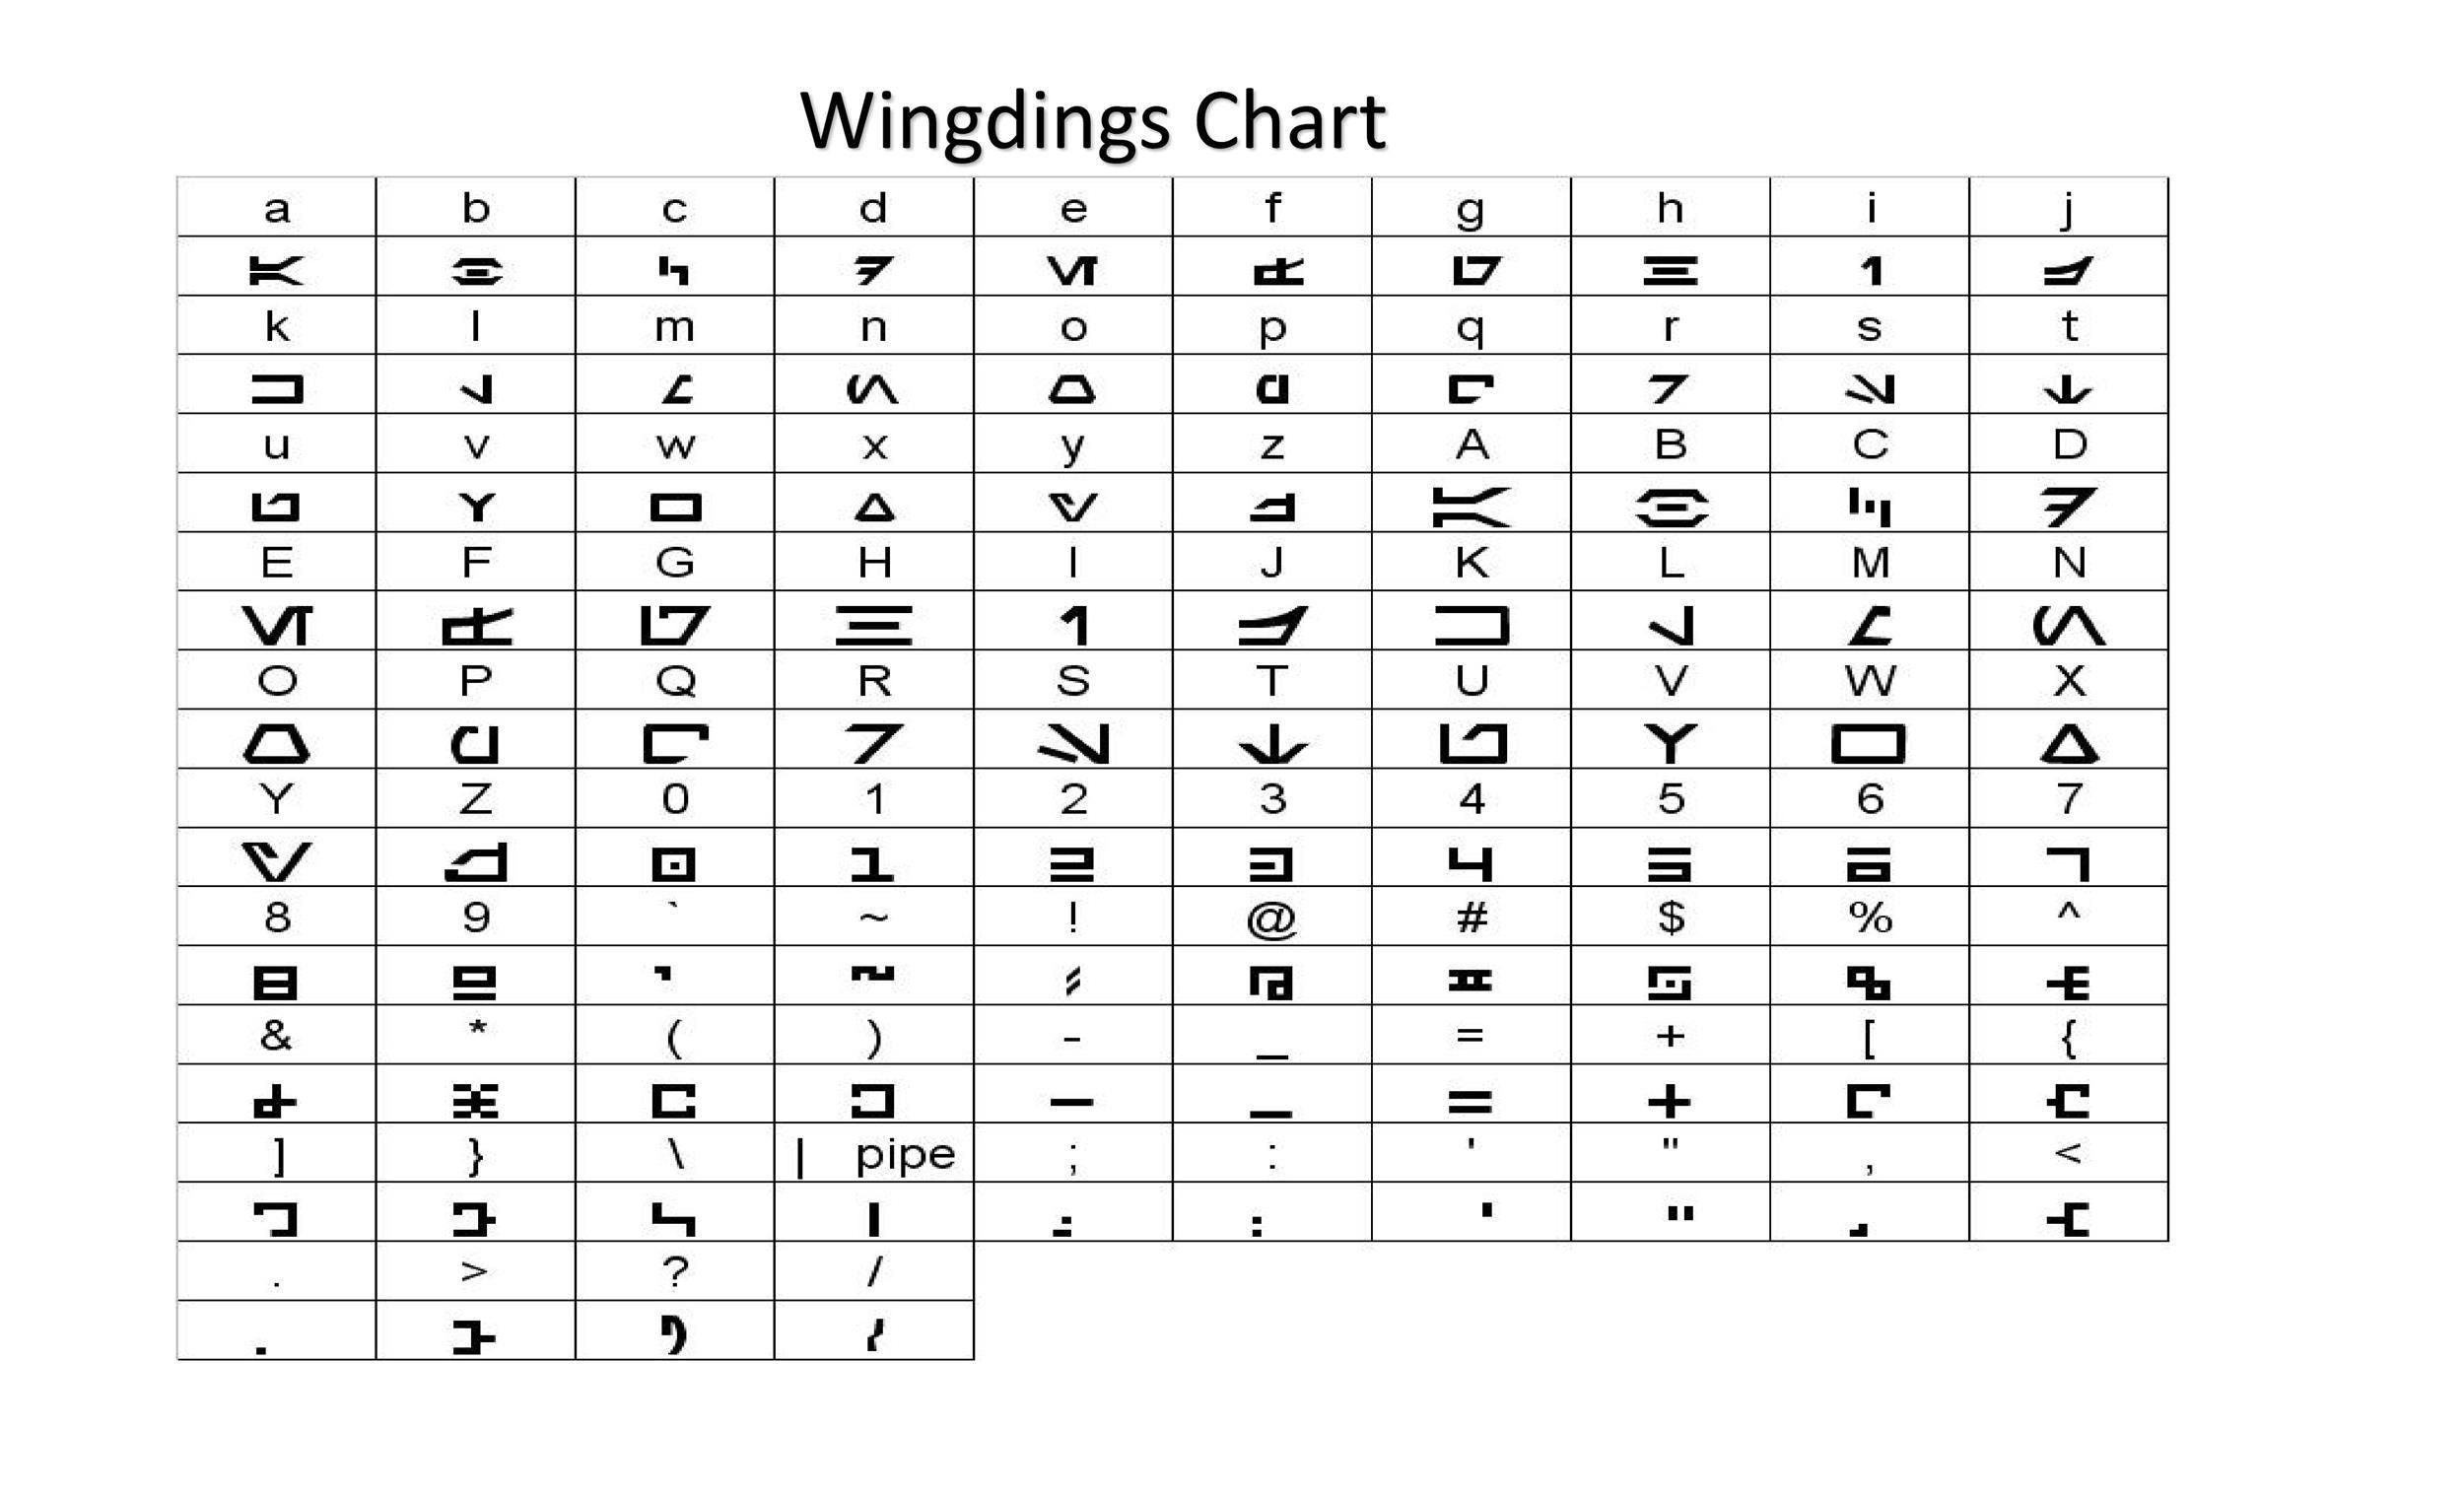 Free wingdings translator template 27